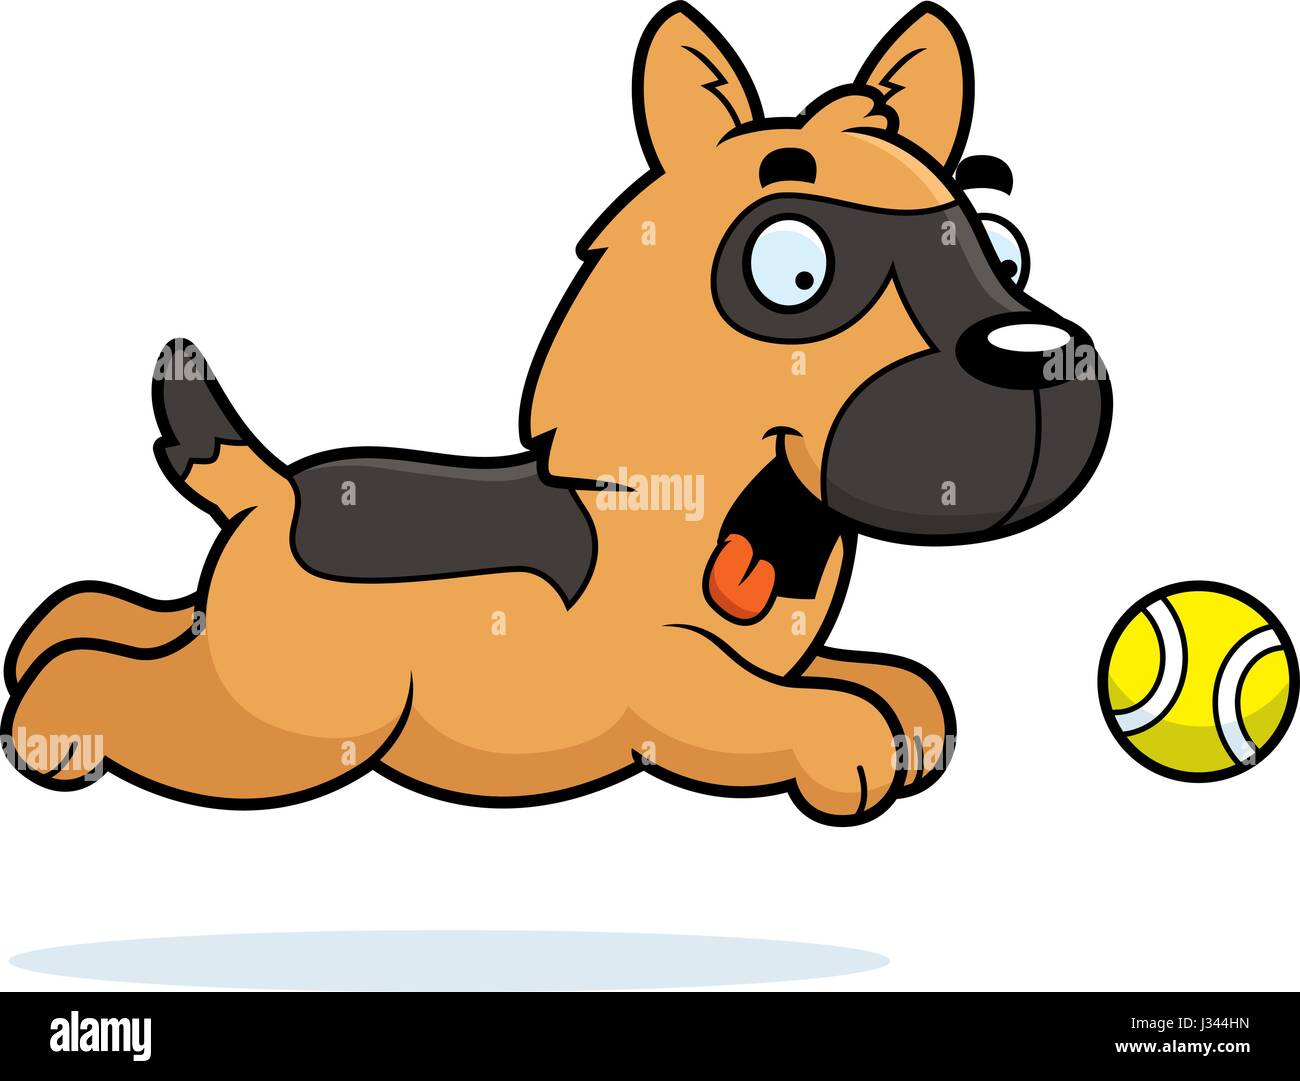 A cartoon illustration of a German Shepherd chasing a ball. - Stock Vector